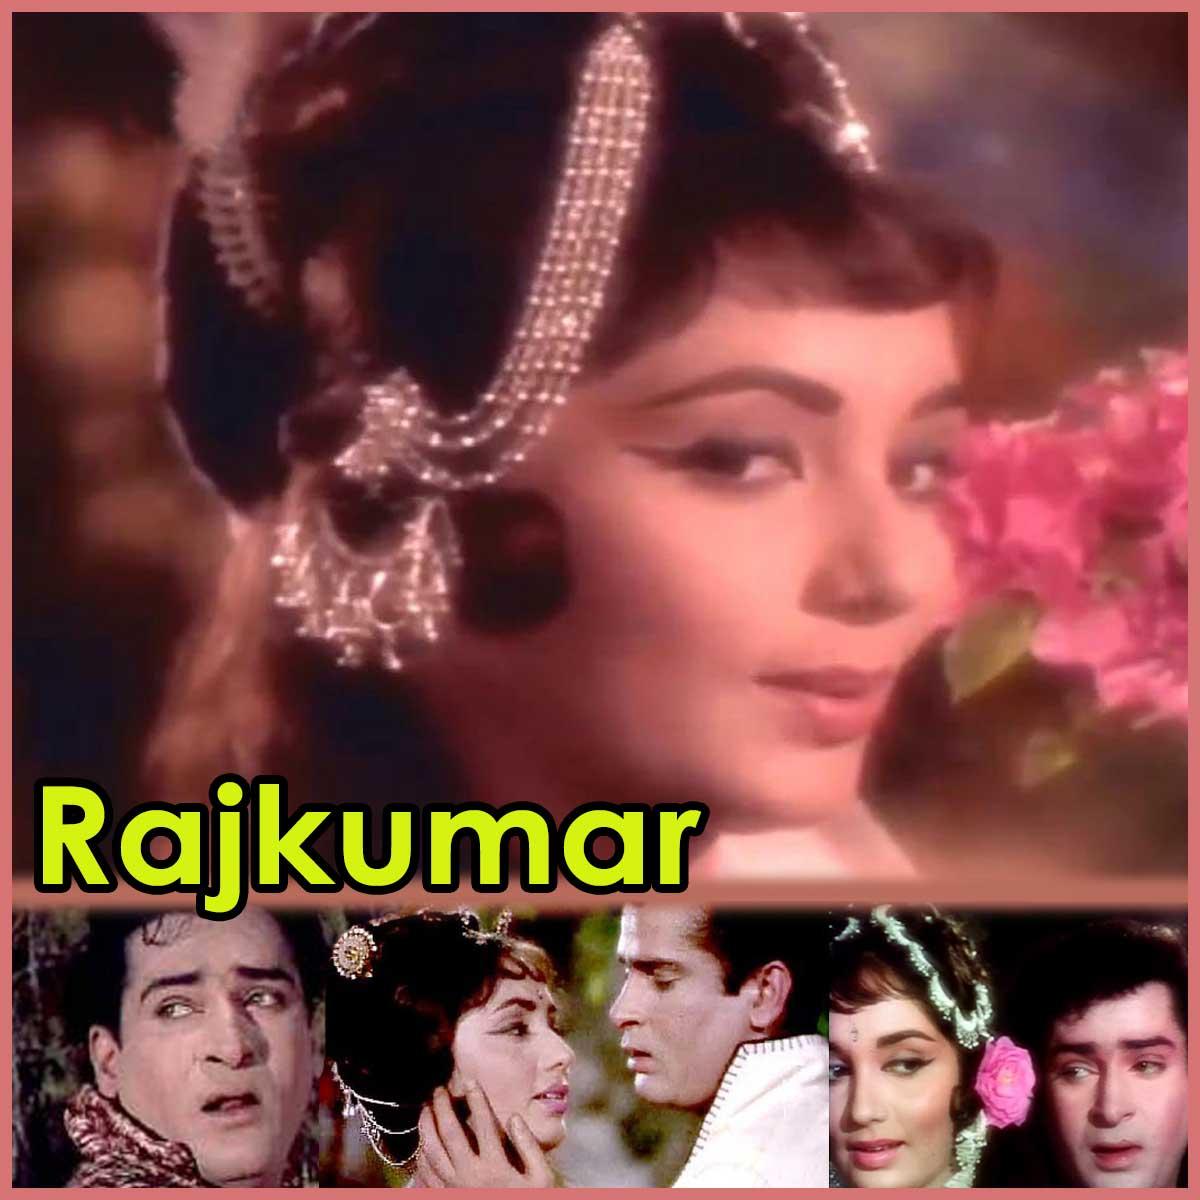 Rajkumar mp3 songs free download starmusiq